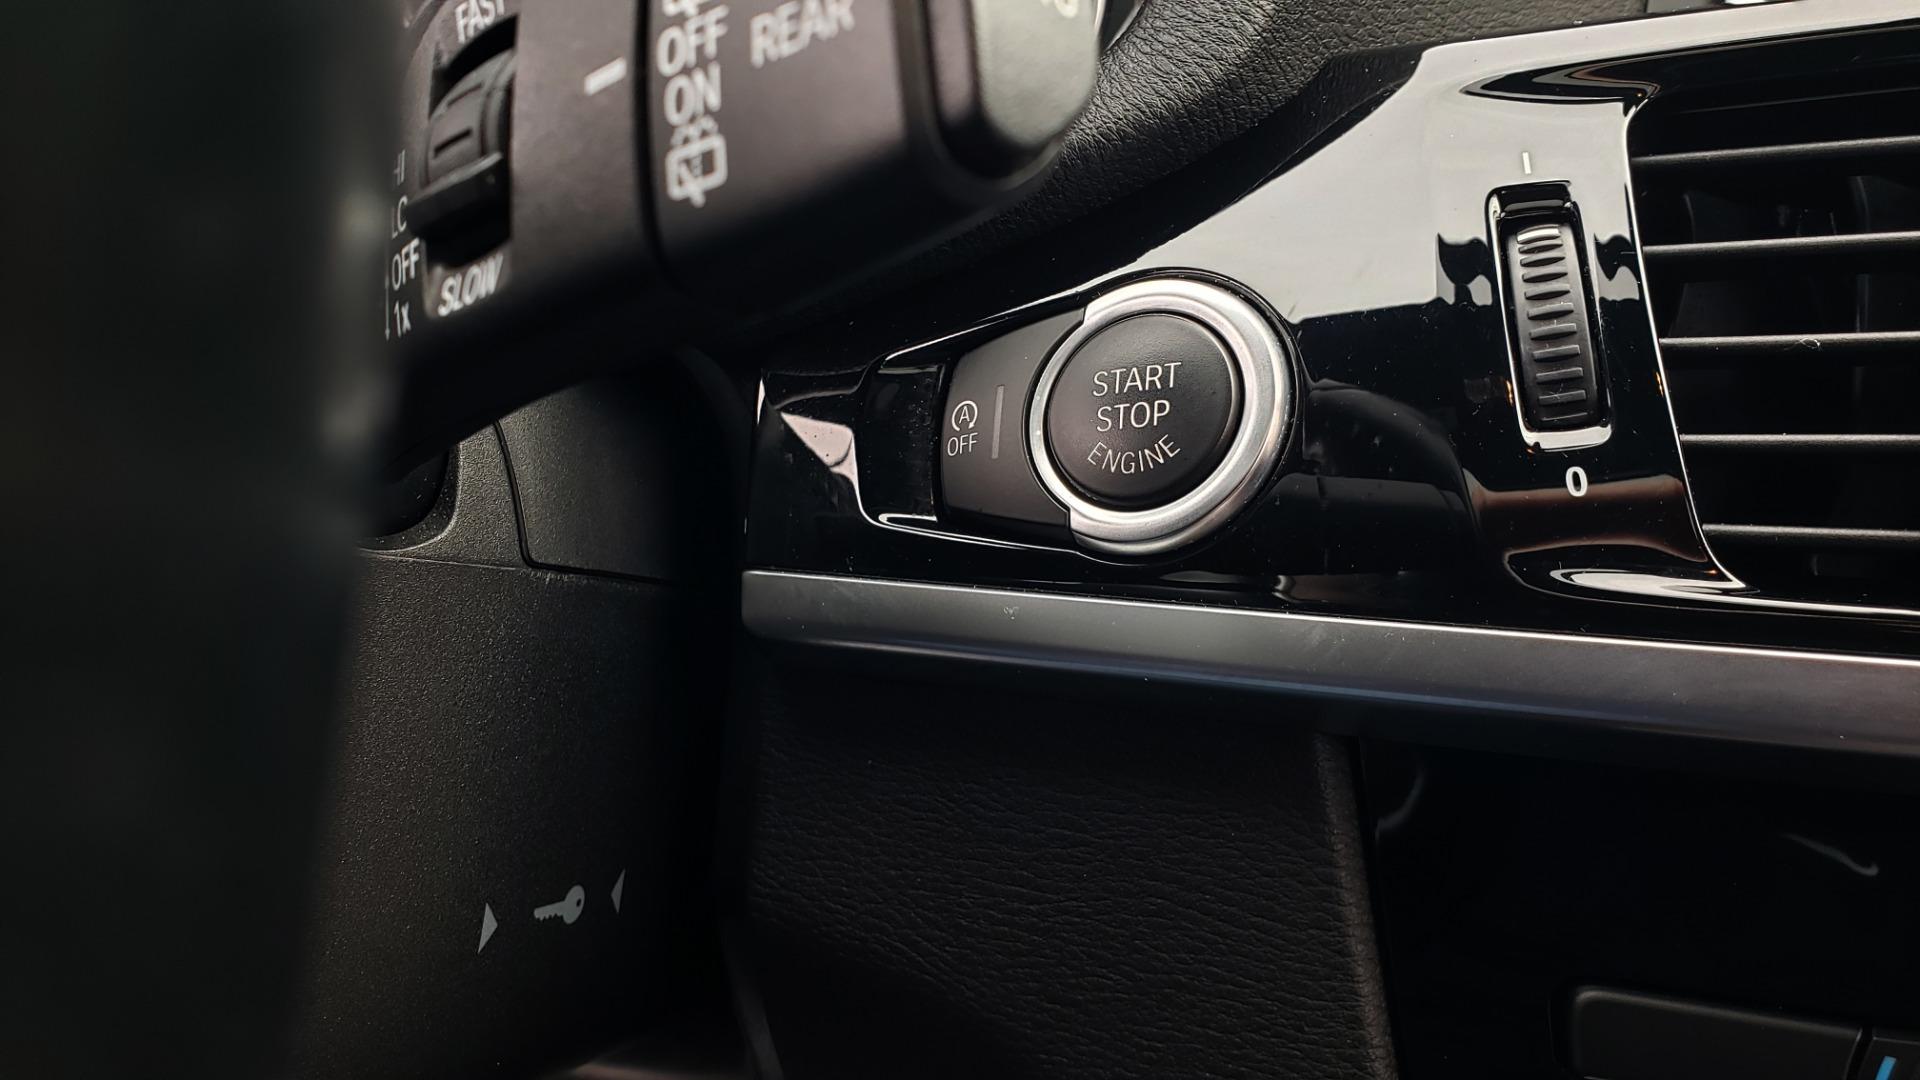 Used 2017 BMW X3 XDRIVE35I M-SPORT / DRVR ASST PLUS / TECHNOLOGY / HUD / BLIND SPOT for sale Sold at Formula Imports in Charlotte NC 28227 44